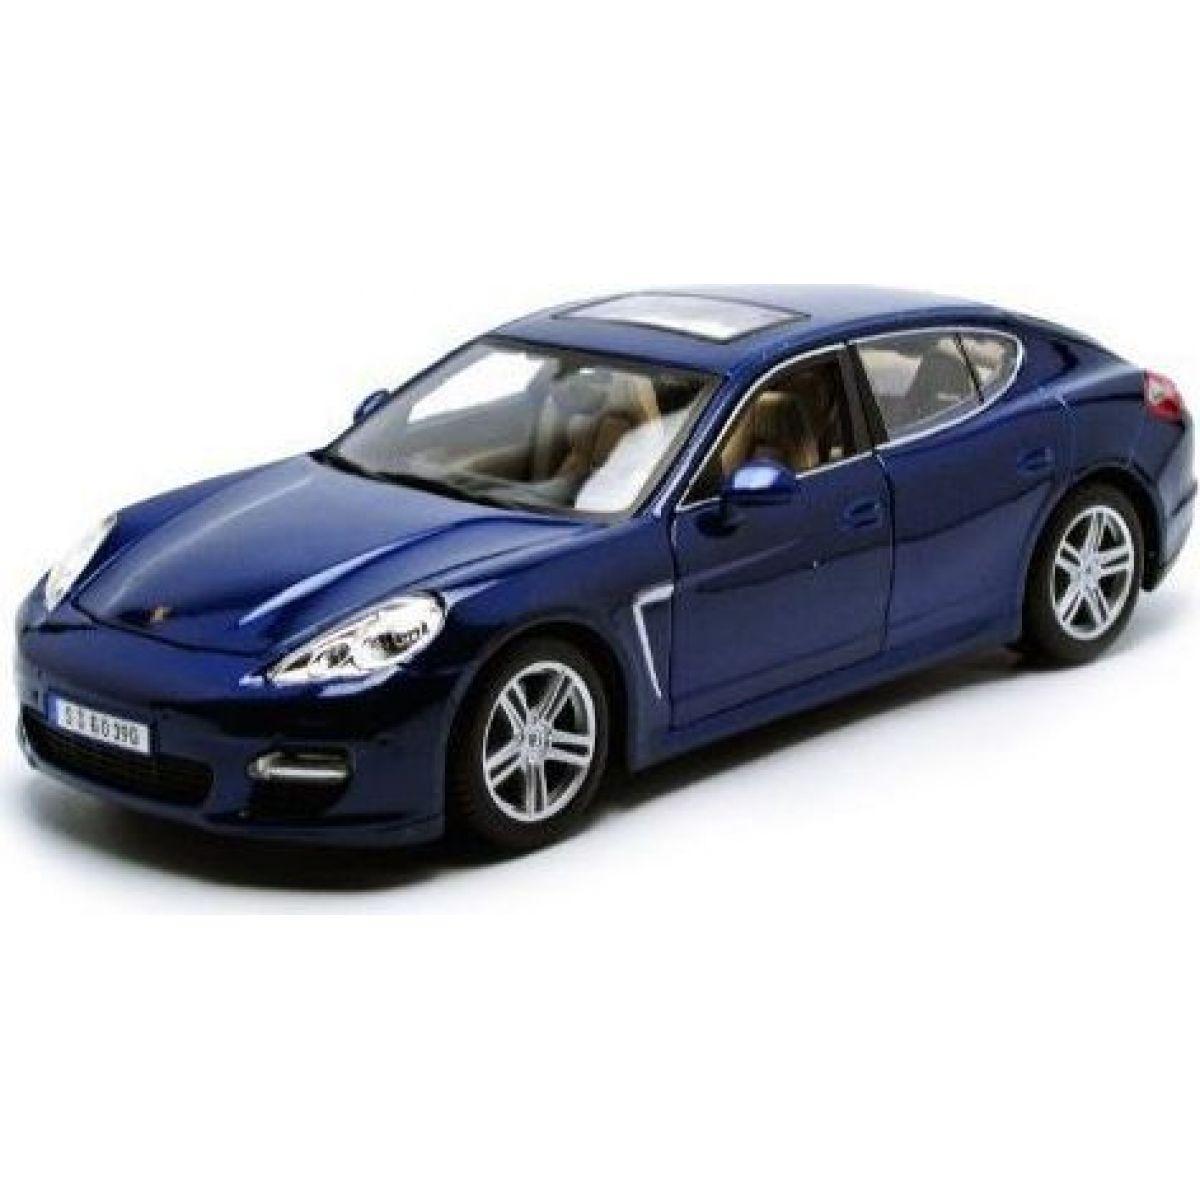 HM Studio kovový model Porsche Panamera S 1:24 Modré